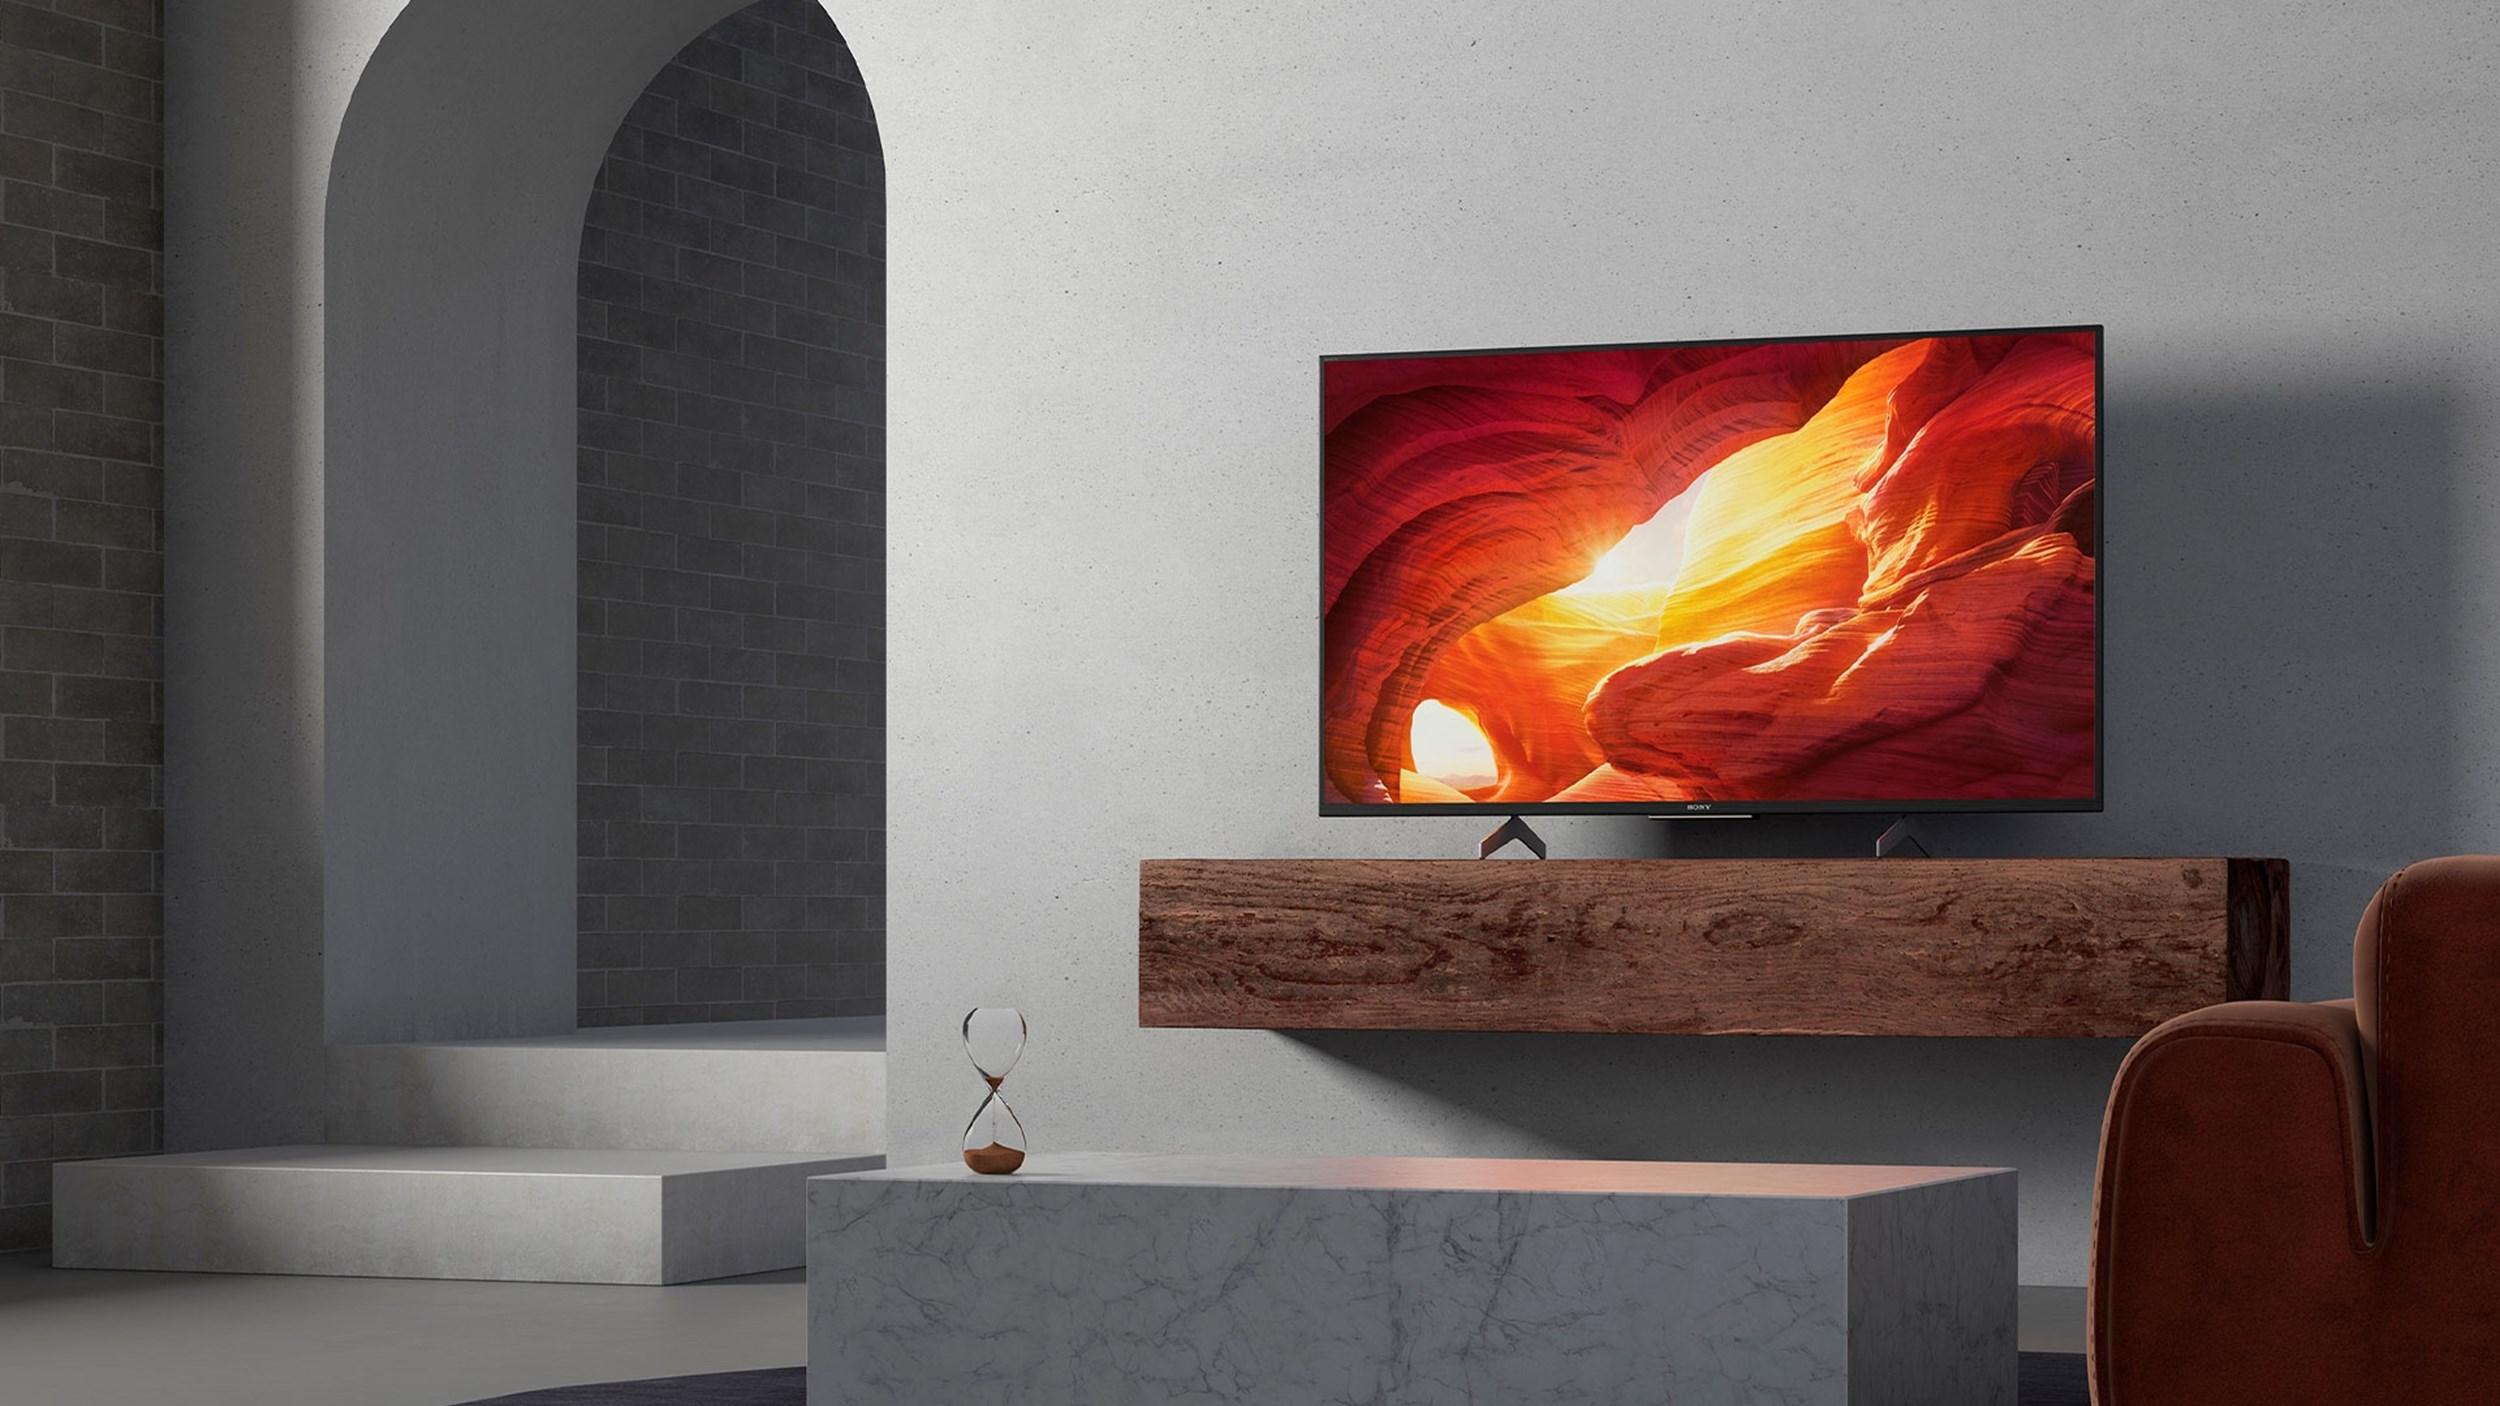 Sony KD-43XH8599 UHD-TV